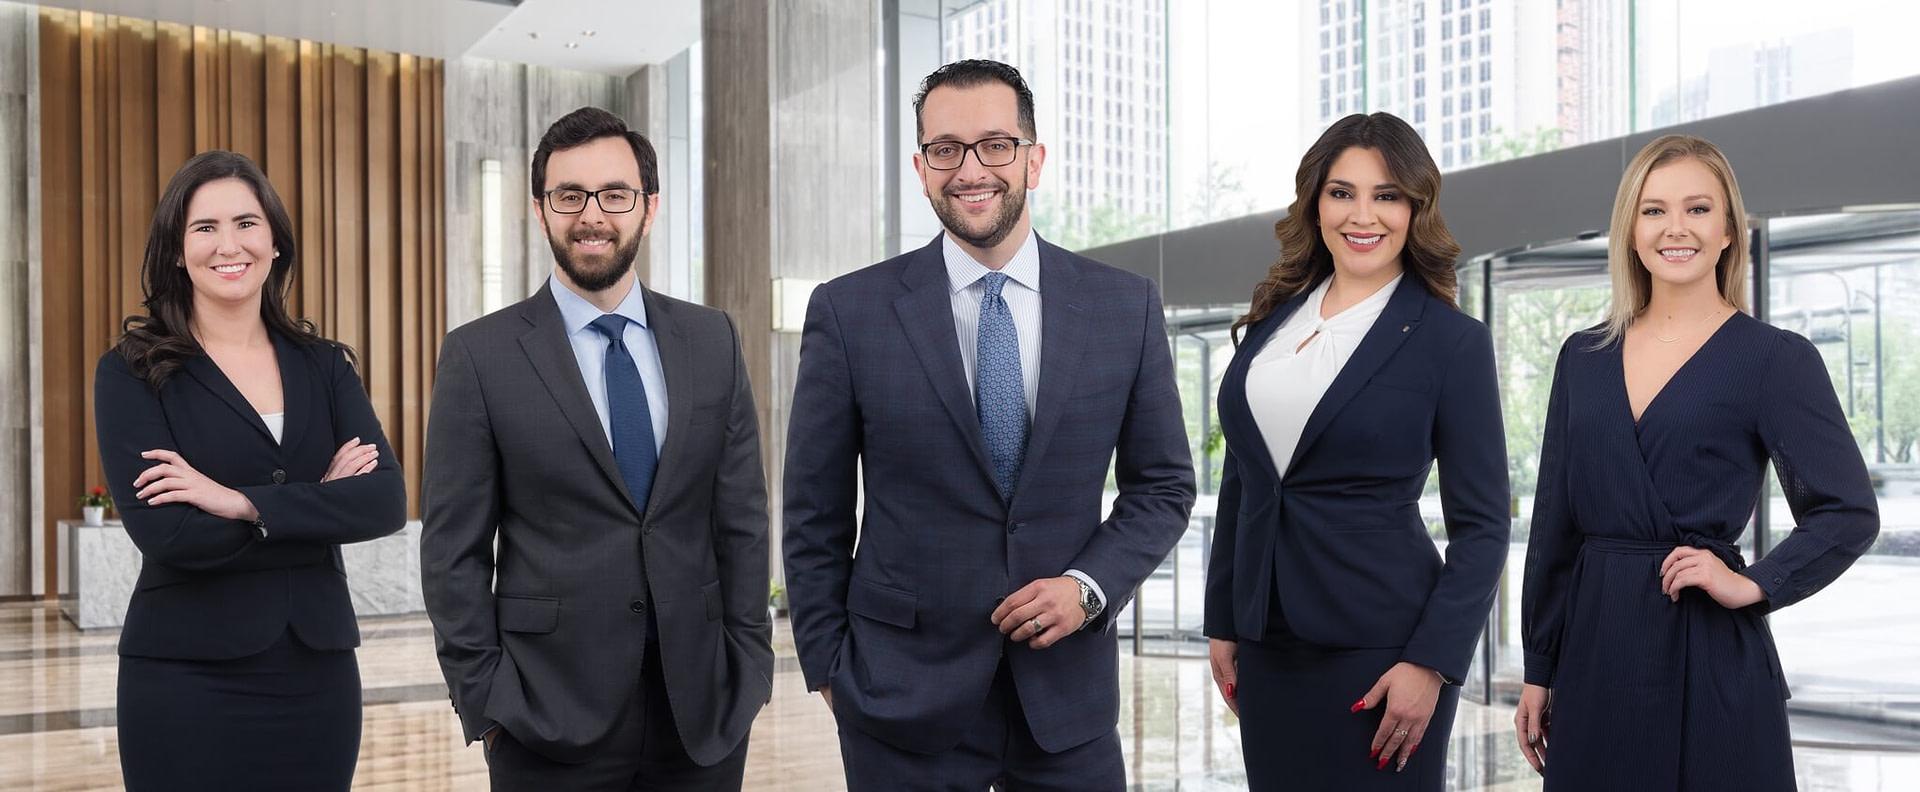 San Diego Criminal Defense Team